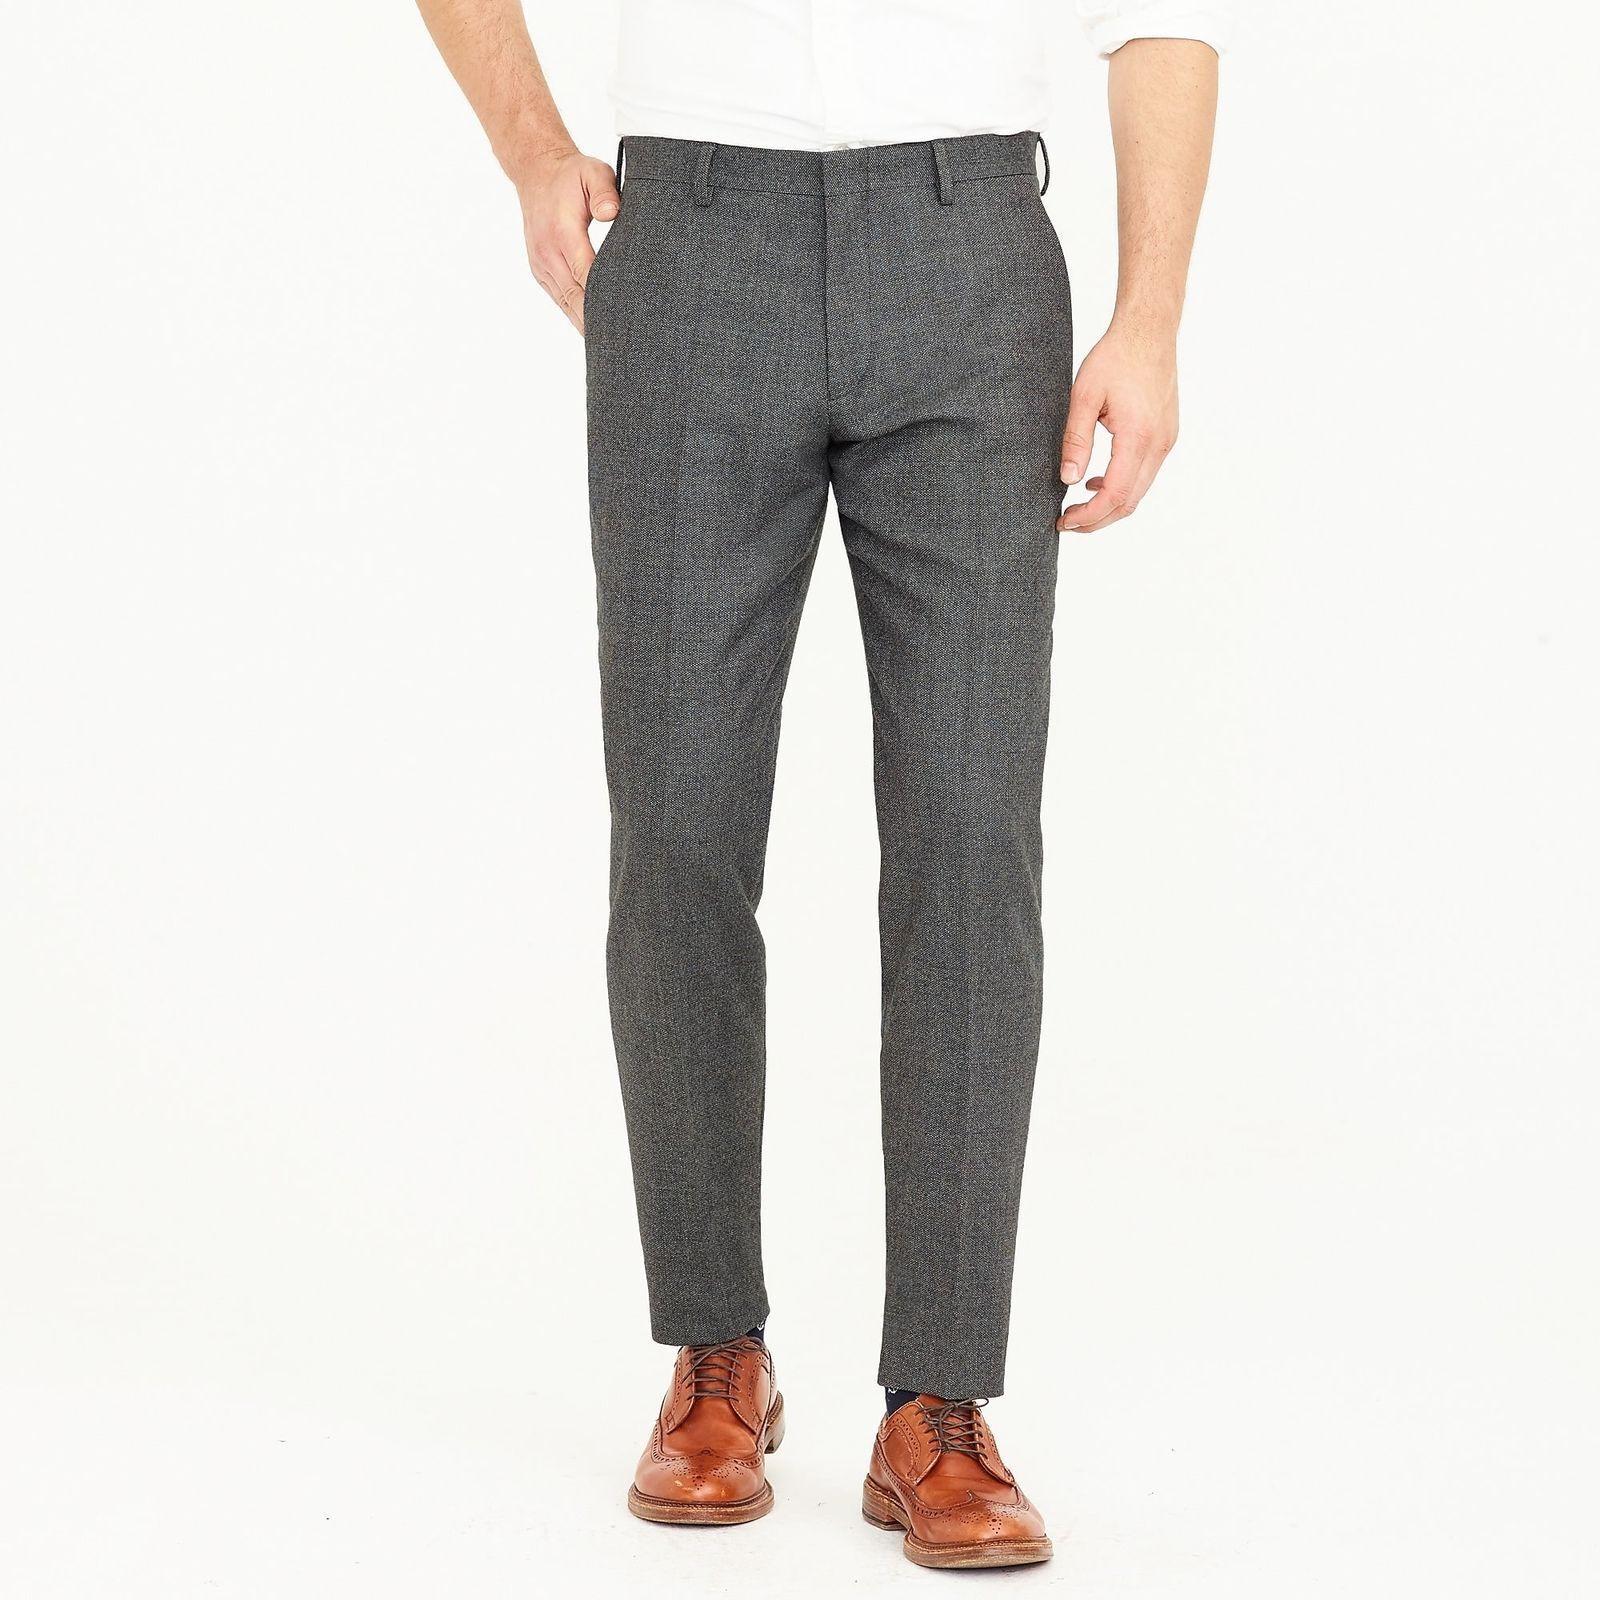 J.Crew Ludlow Slim Suit Pant In Italian Stretch Wool   34 34   Warm Grey